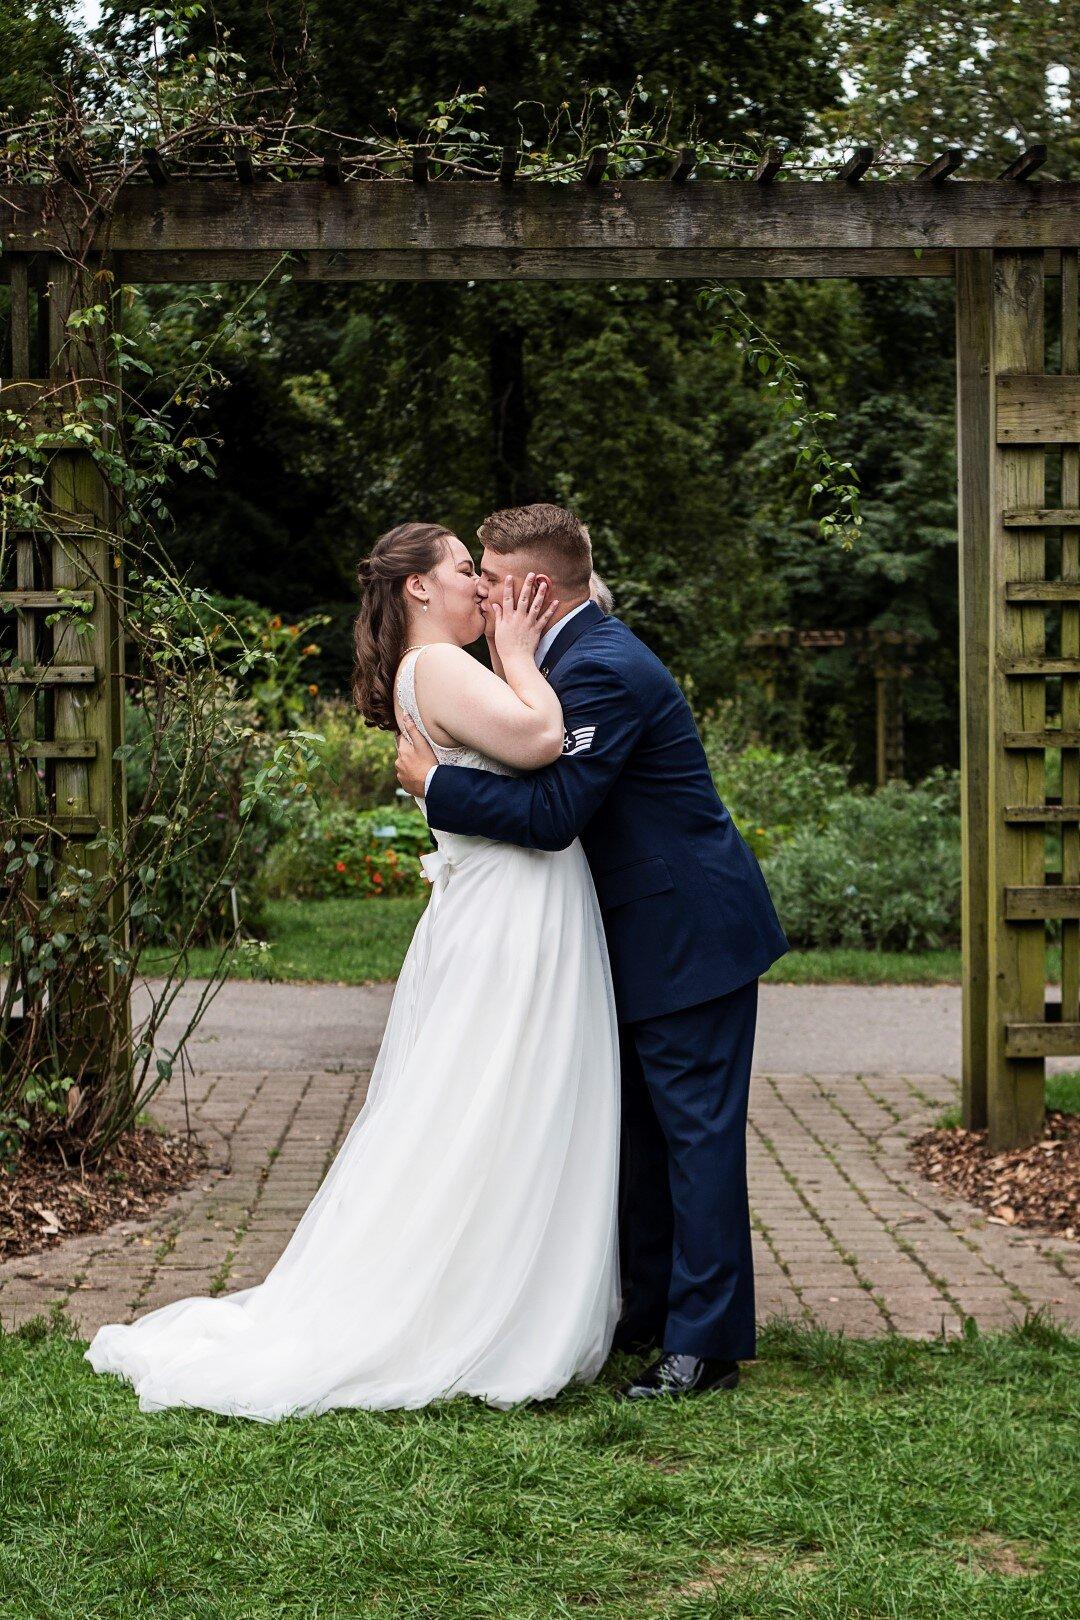 Courtney+Brendon_2019_Wedding_52RMS_3038.jpg